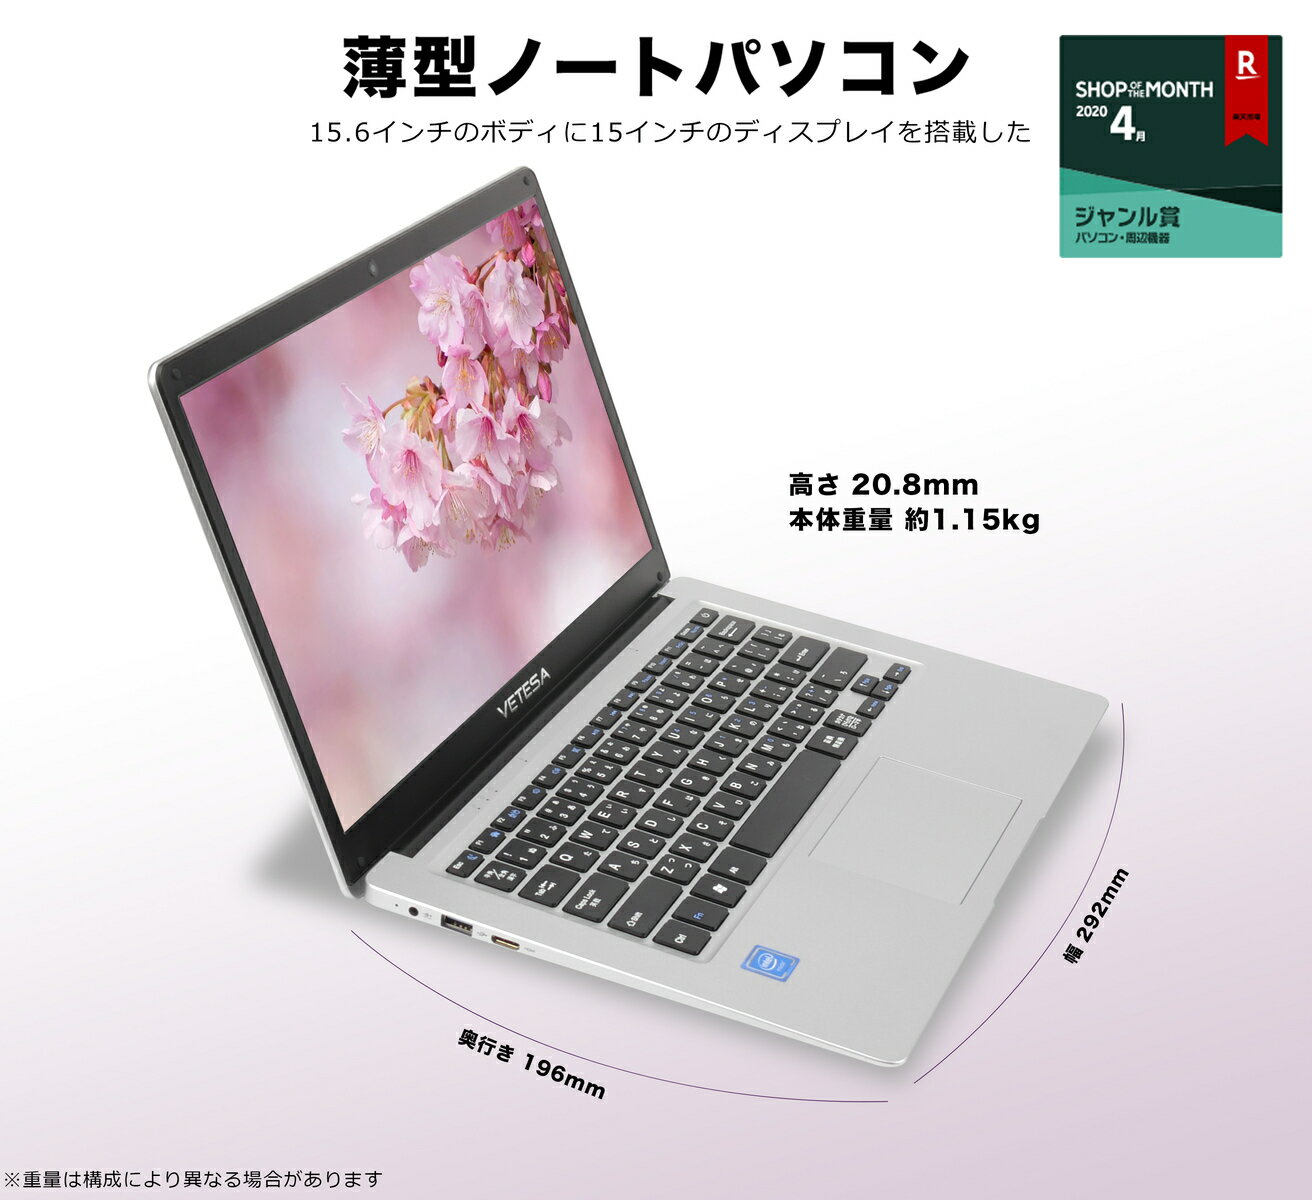 ★新品★ -在宅勤務応援-【Win 10搭載】【OFFICE搭載】 Intel E8000 /メモリー:4GB/高速SSD:64GB)/IPS広視野角15.6型フルHD液晶/Webカメラ/USB 3.0/miniHDMI/無線機能/Bluetooth/WPS office付き画像